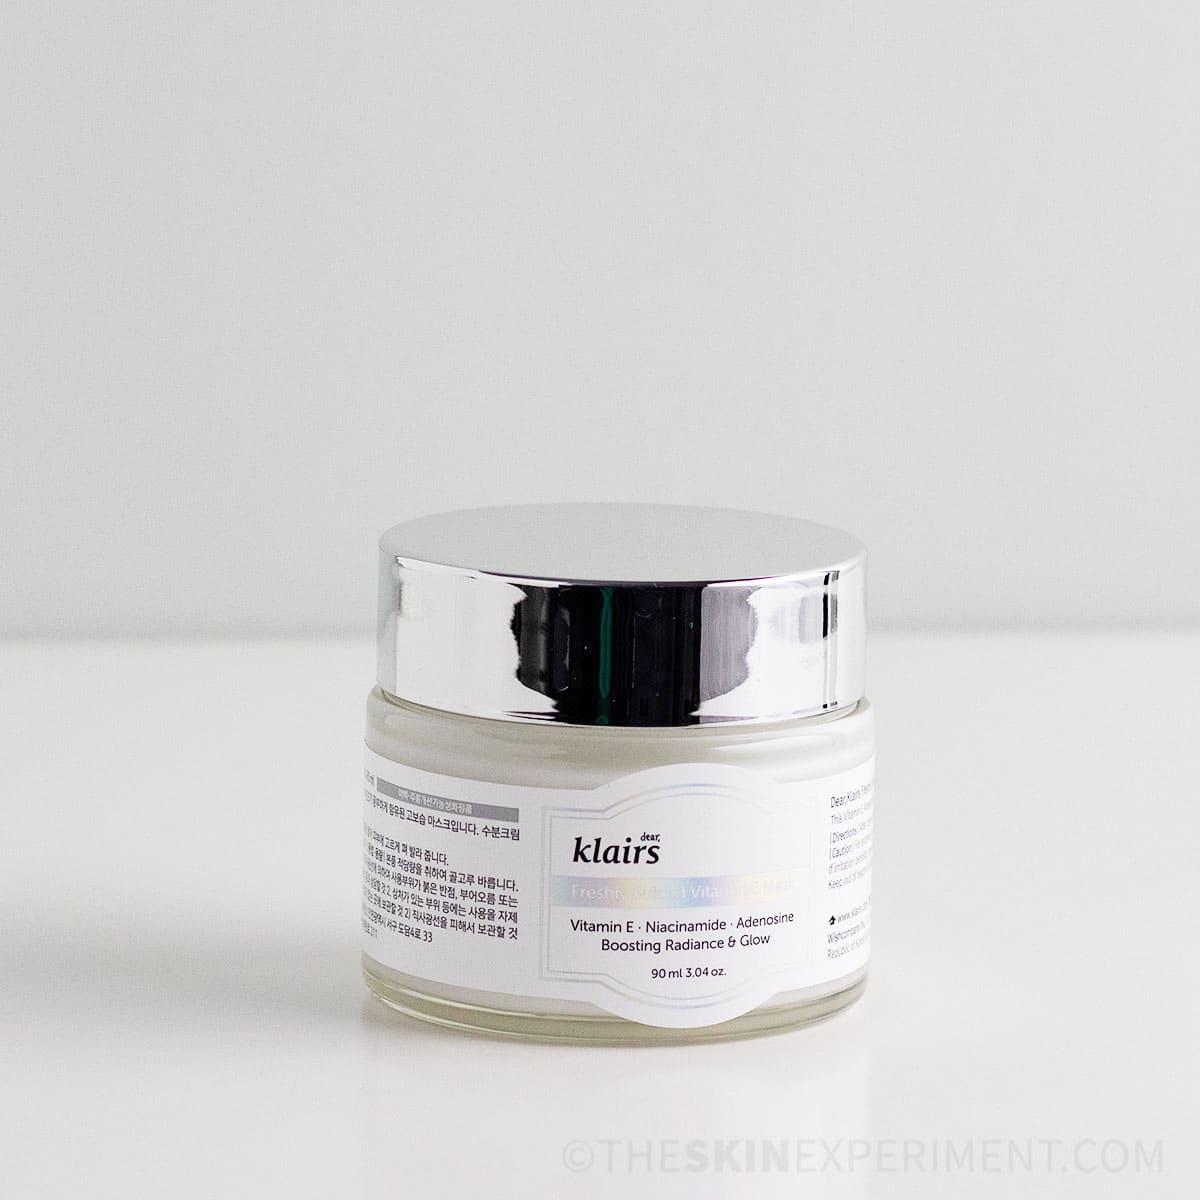 Klairs Vitamin E Mask Review